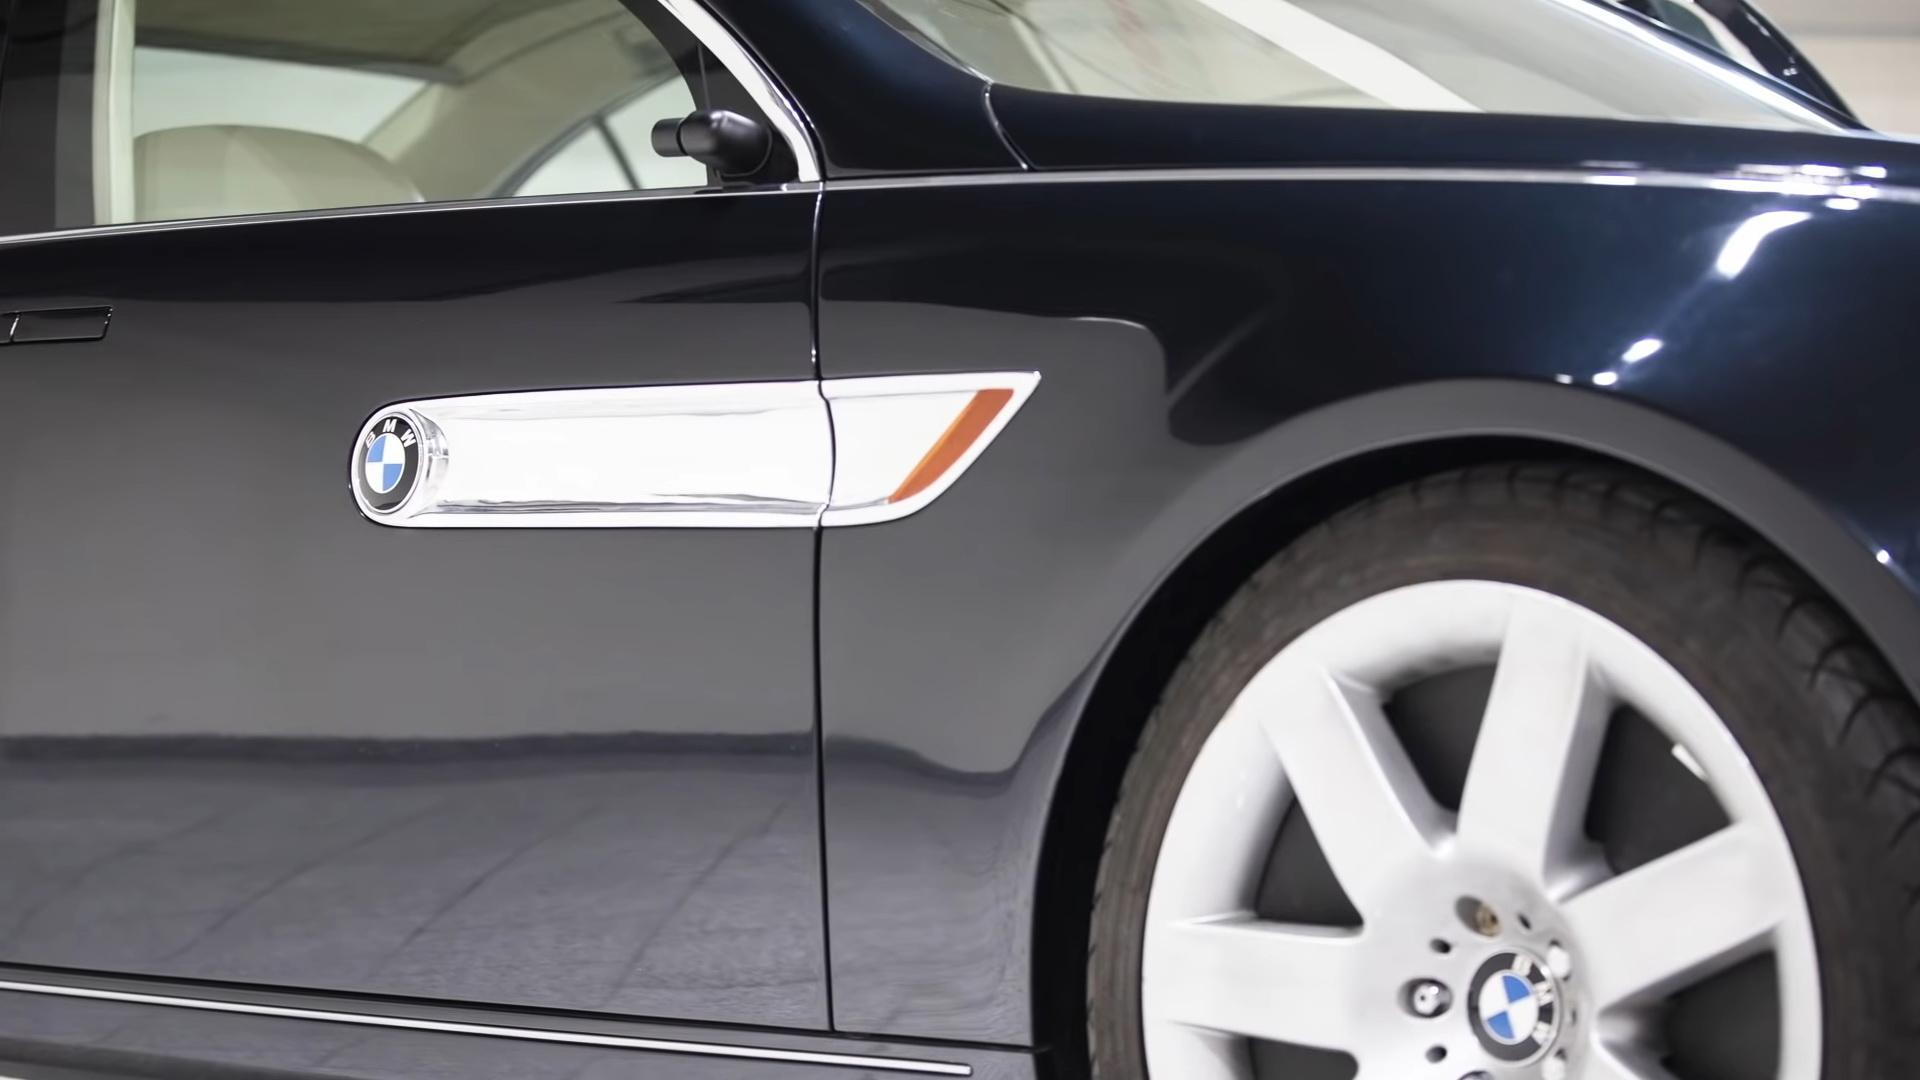 BMW-7-Series-Concept-40.jpg